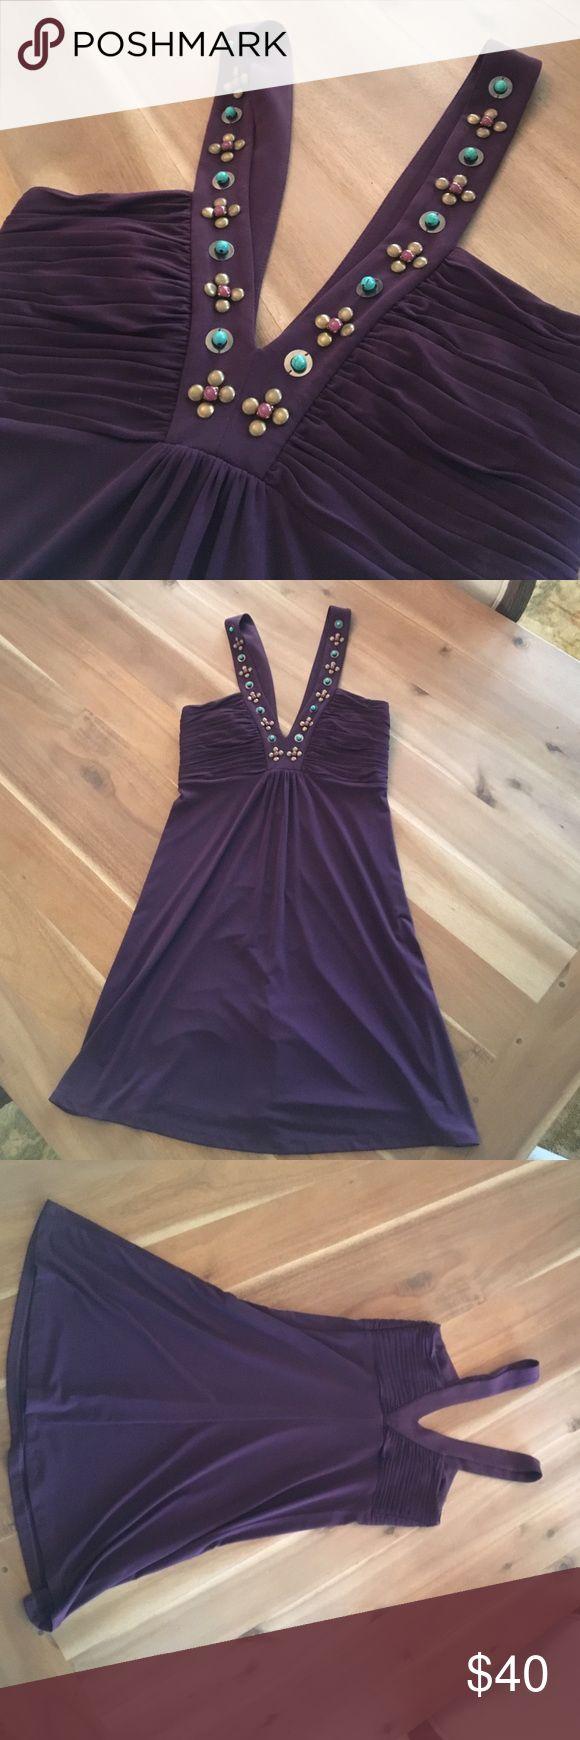 Laundry by Shelli Segal Dress Eggplant Laundry Dress Laundry by Shelli Segal Dresses Mini